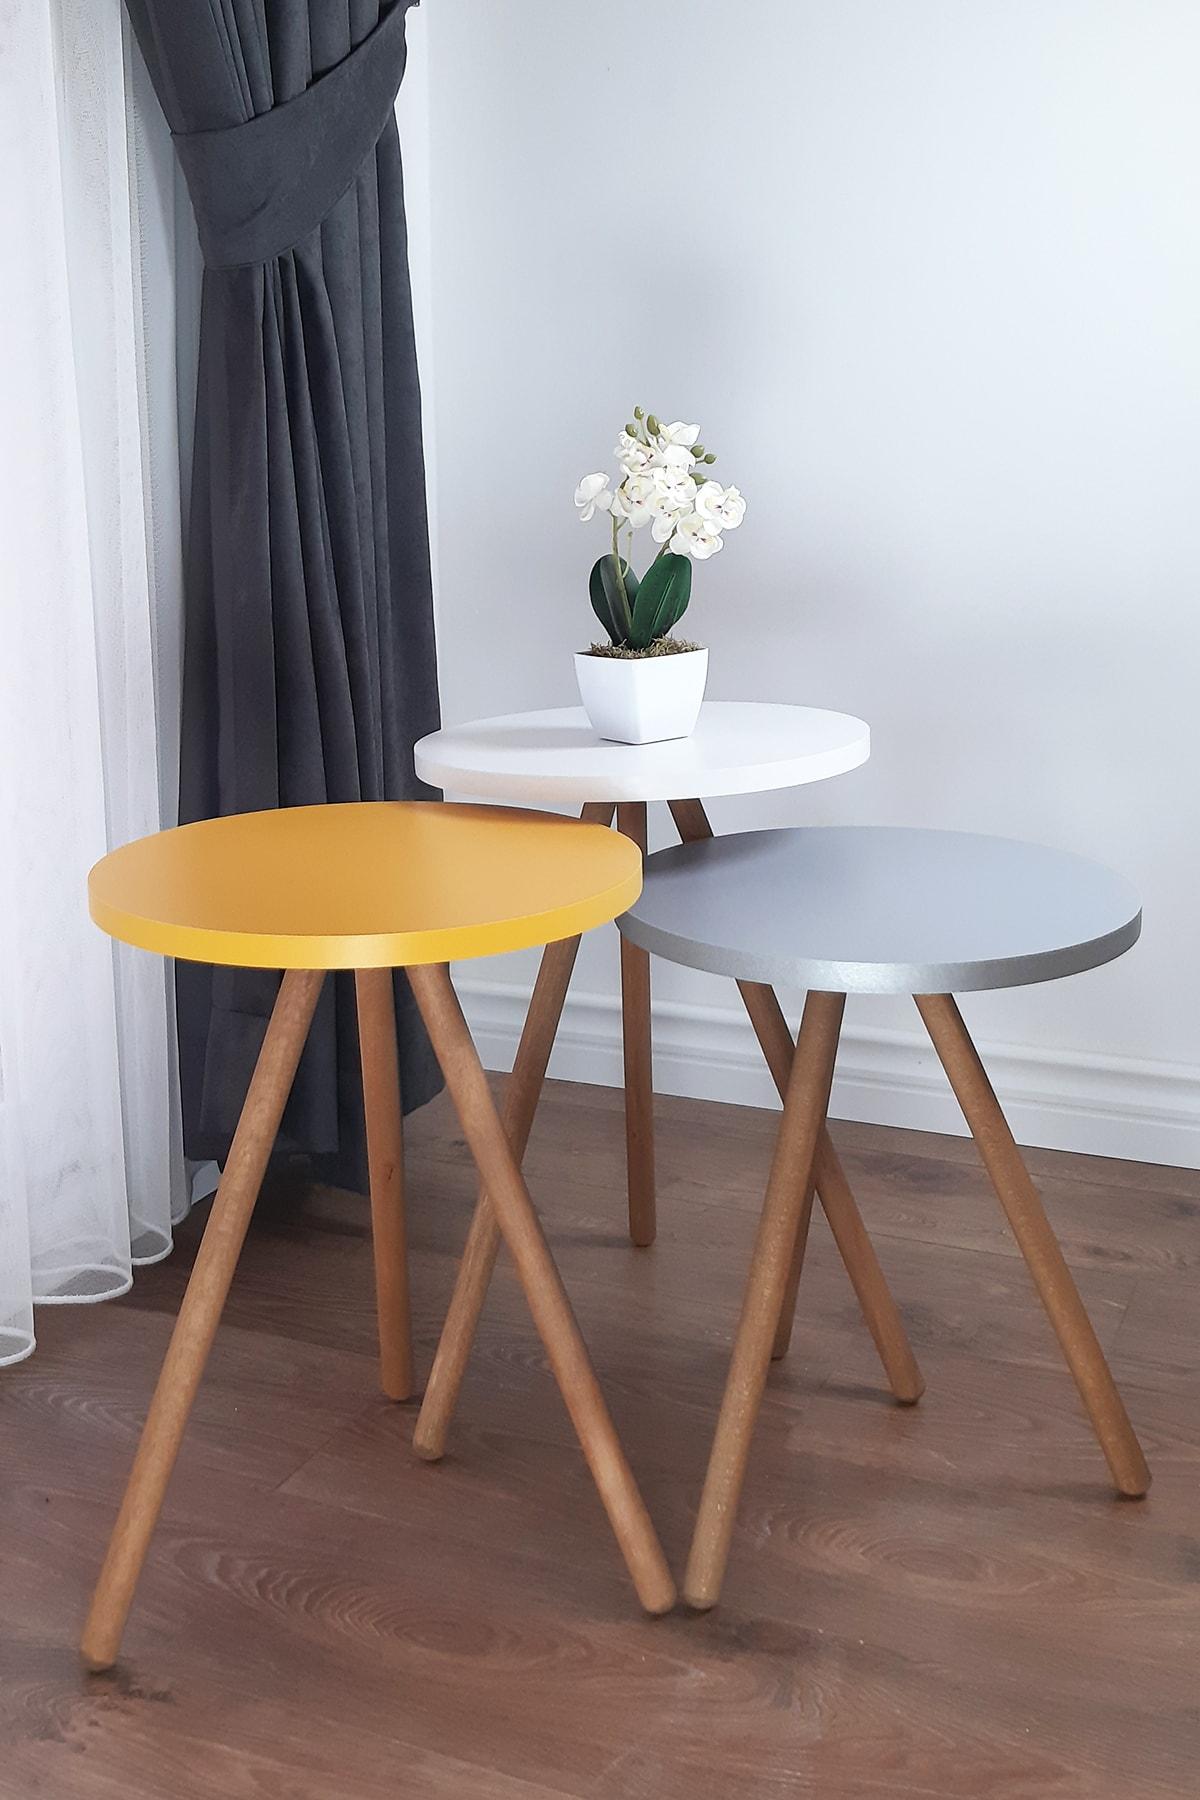 Renkli Üçlü Zigon Sehpa Ahşap Ayaklı Yuvarlak Pastel Tasarım Gri Beyaz Sarı